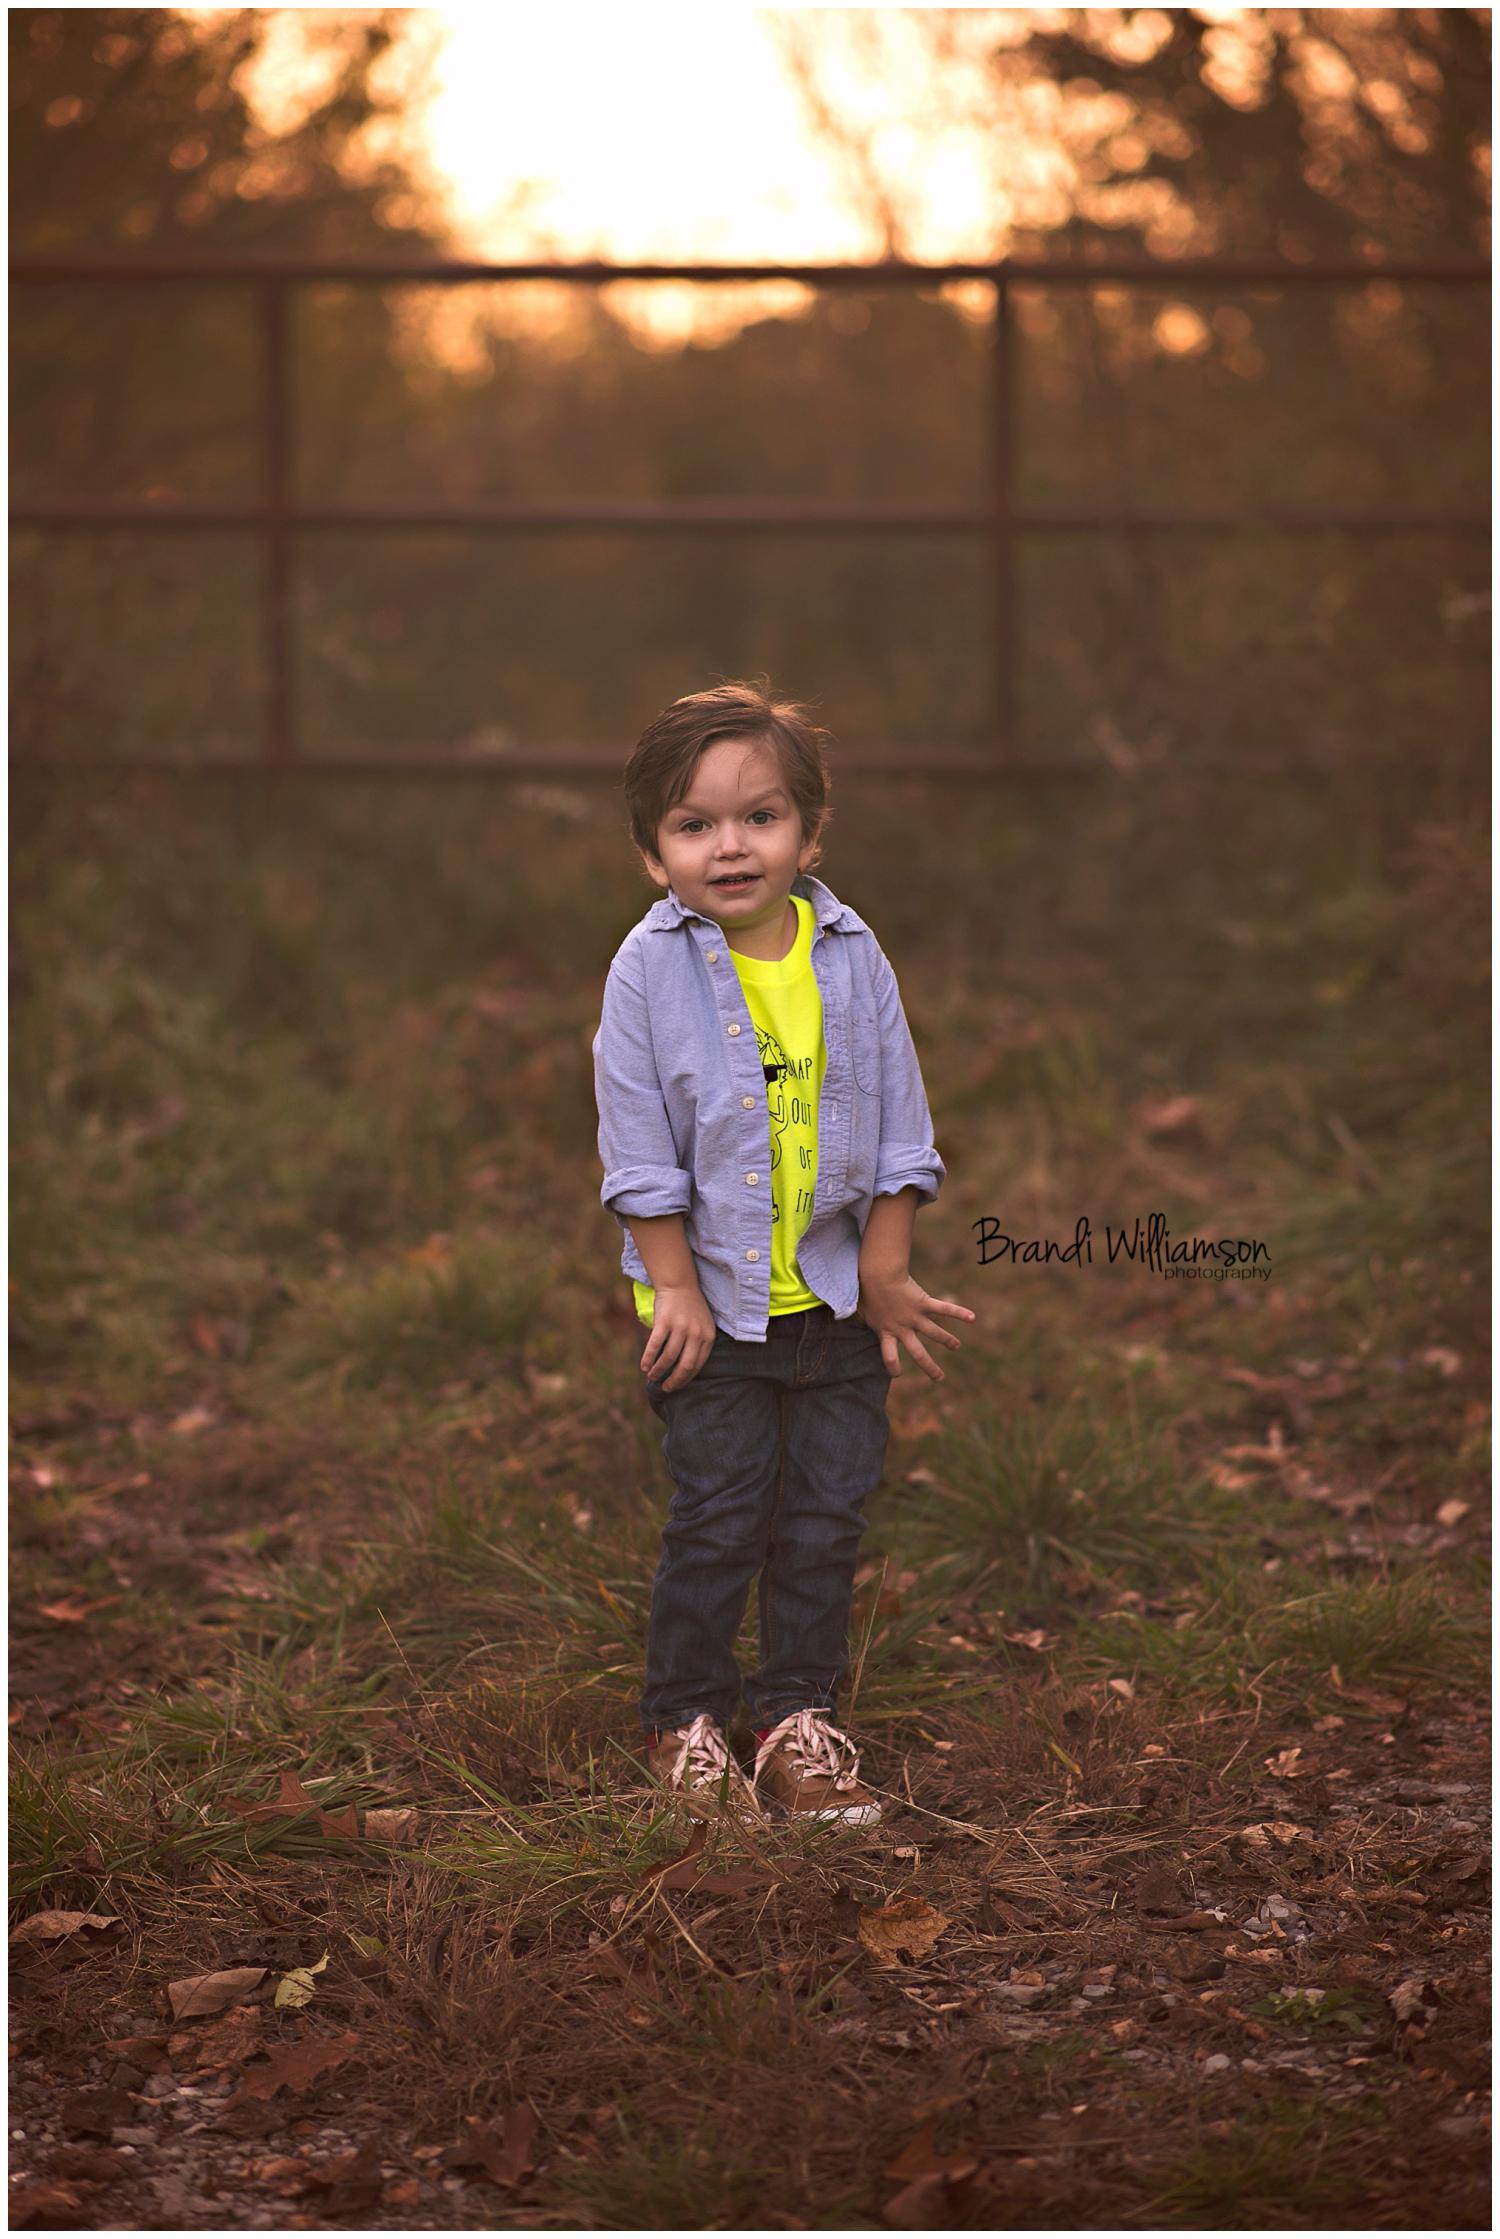 Dover, New Philadelphia Northeast Ohio child photographer | Tuscarawas County OH | © Brandi Williamson Photography